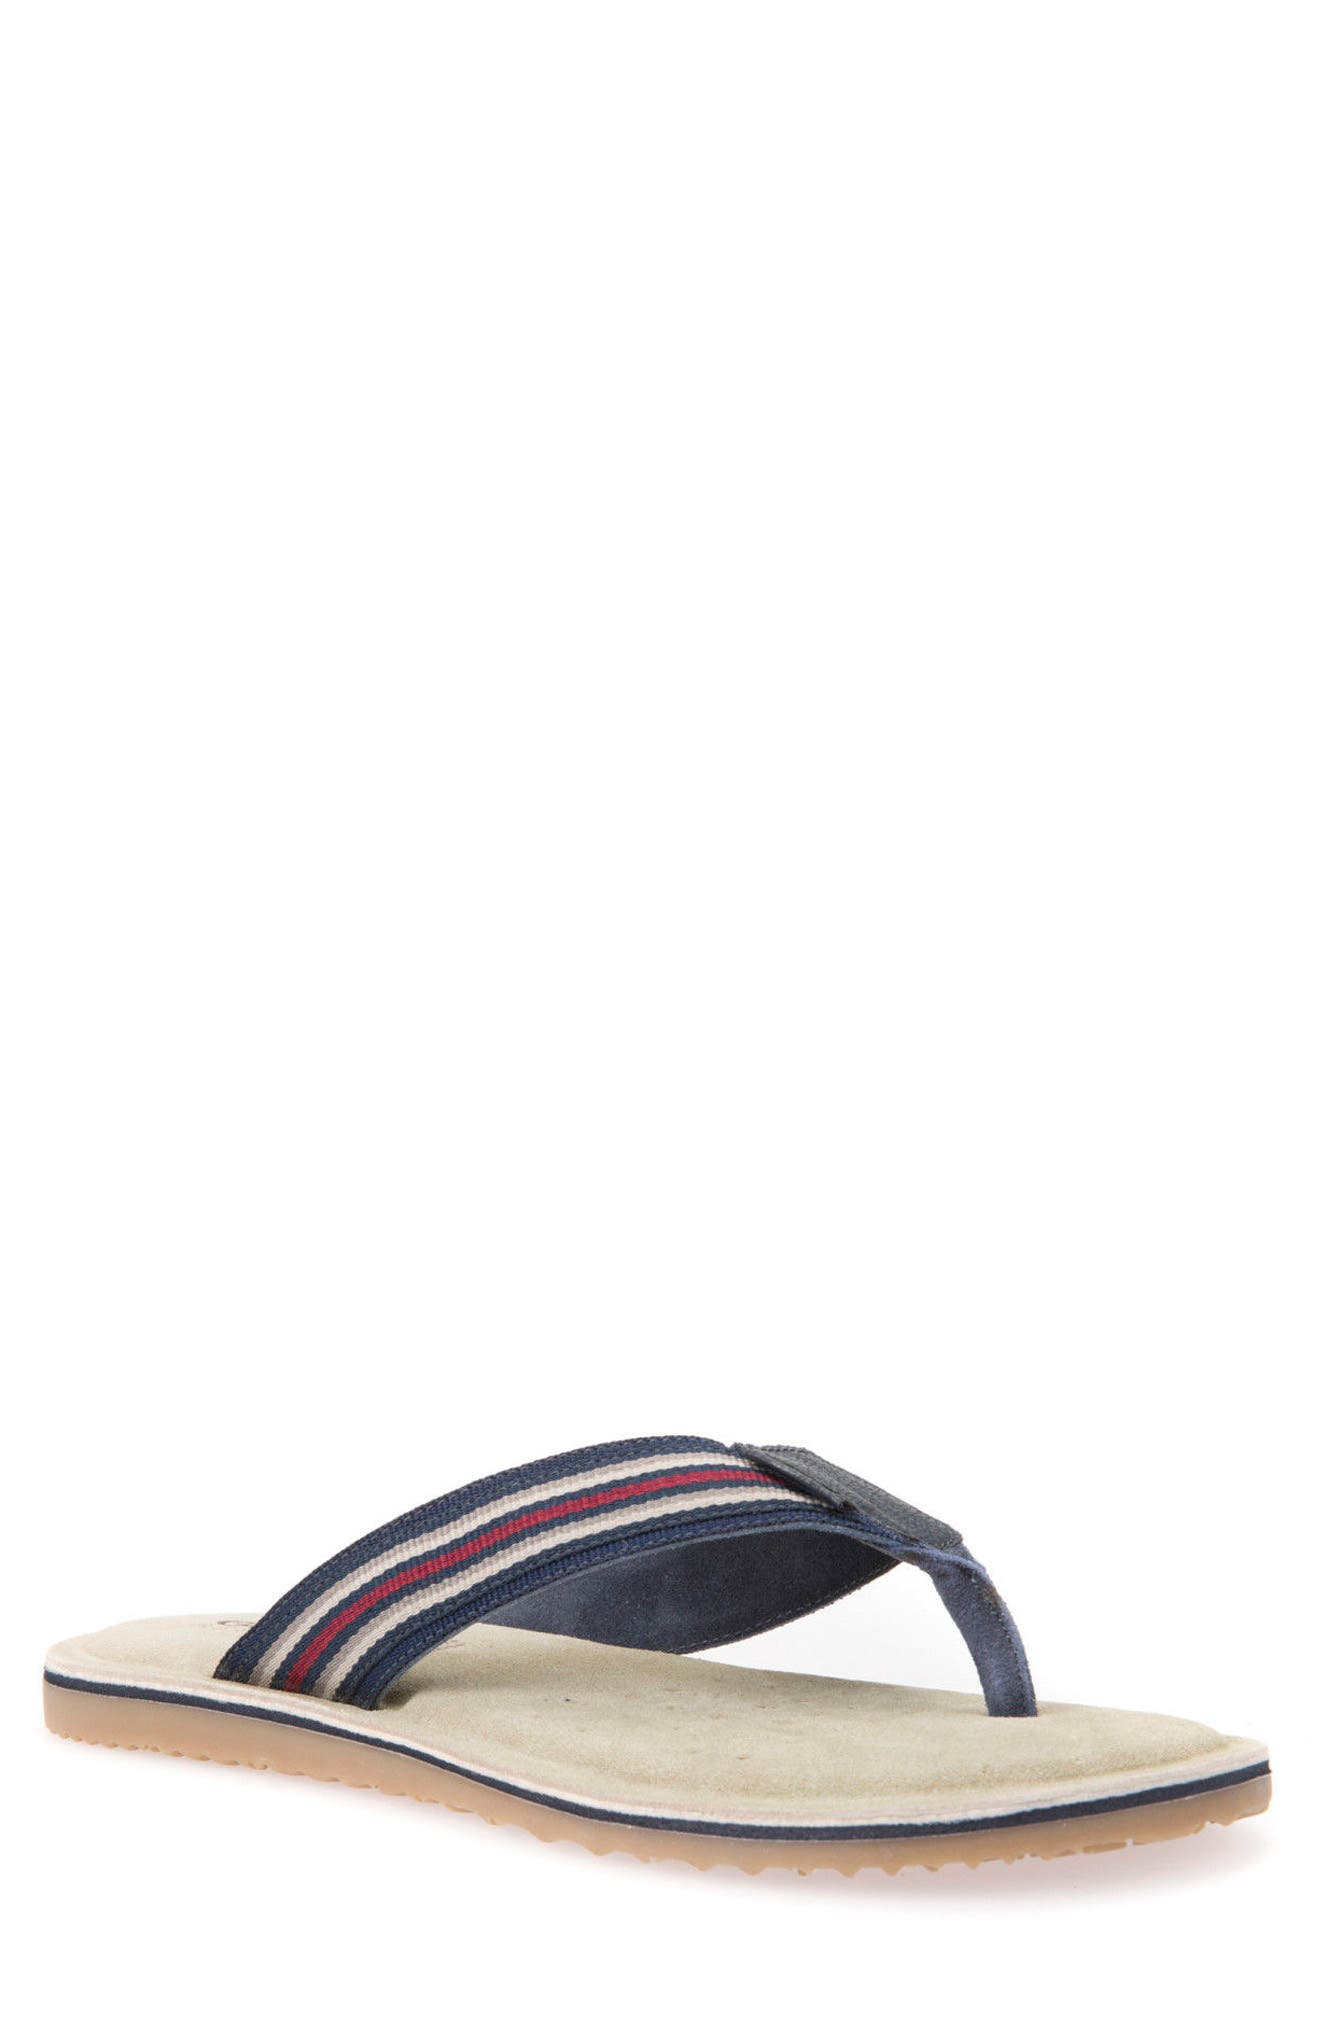 Artie 13 Flip Flop,                         Main,                         color, Navy